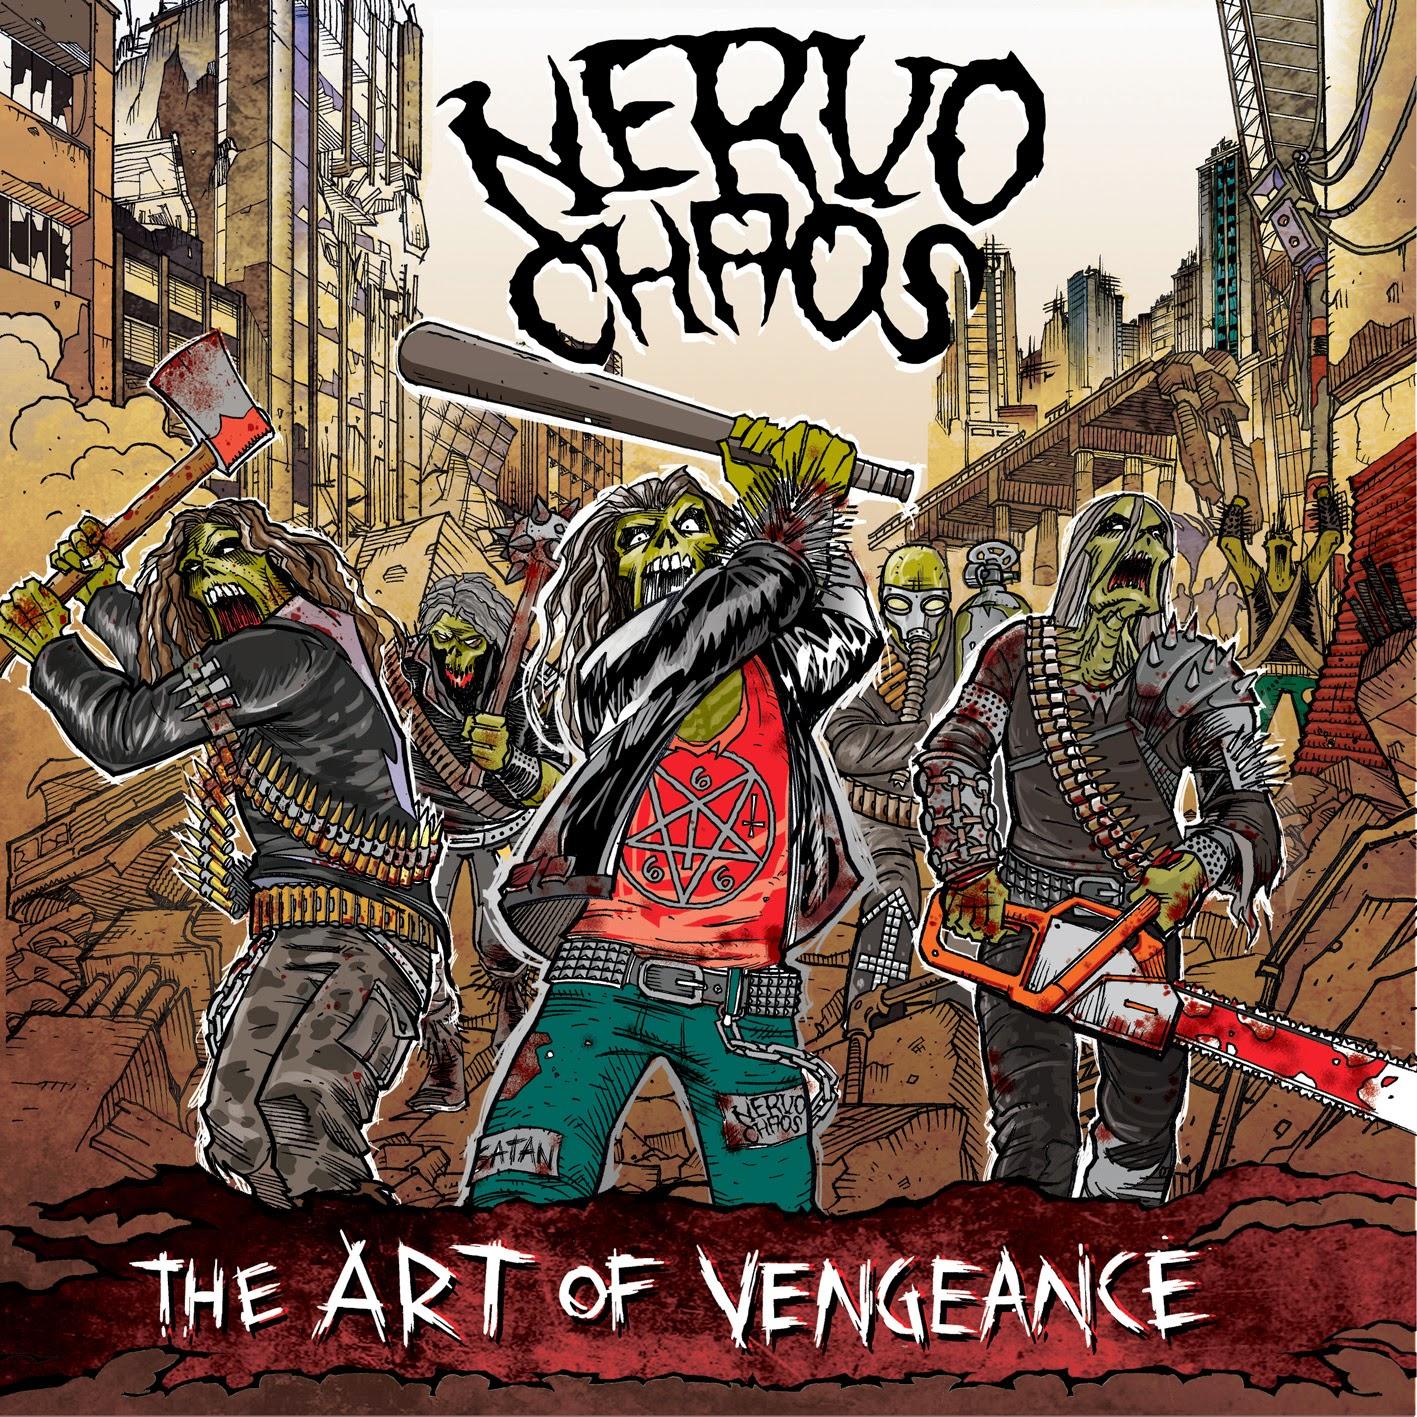 http://questoeseargumentos.blogspot.com.br/2014/10/the-art-of-vengeance-poe-o-nervochaos.html